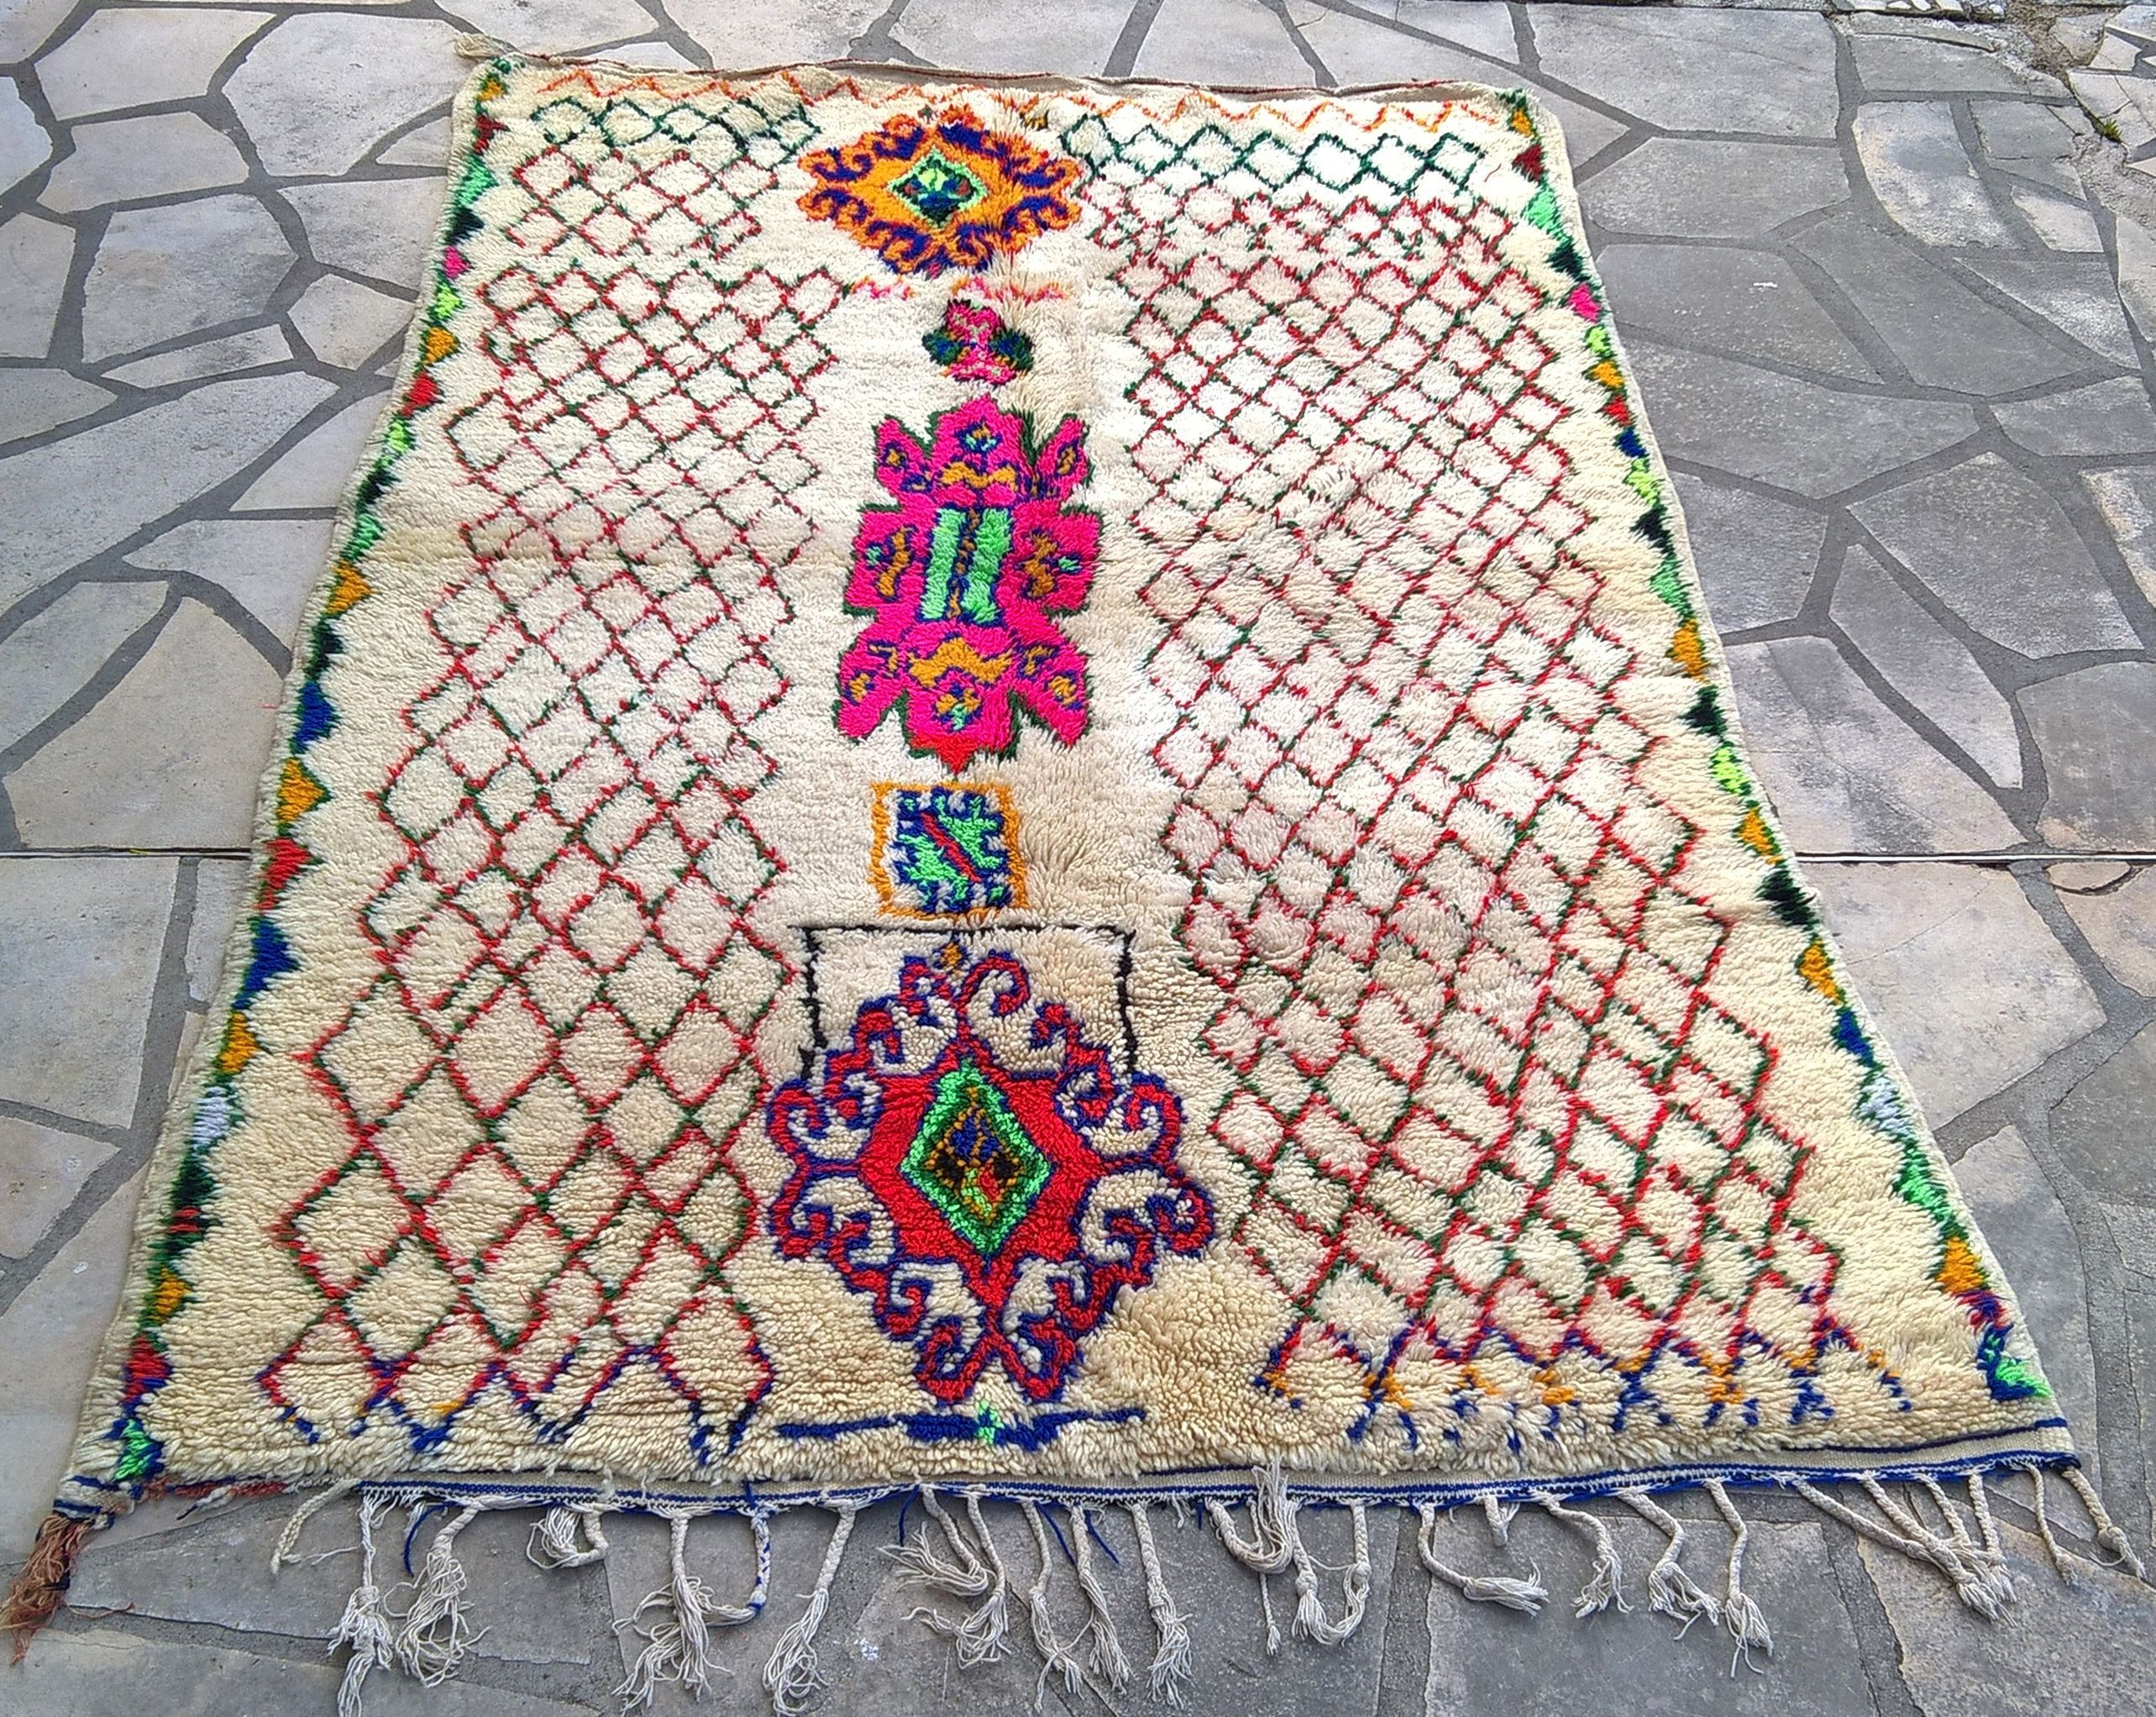 Tapis Marocain Azilal 231 X 143 Cm 91 X 56 Moroccan Rug Azilal